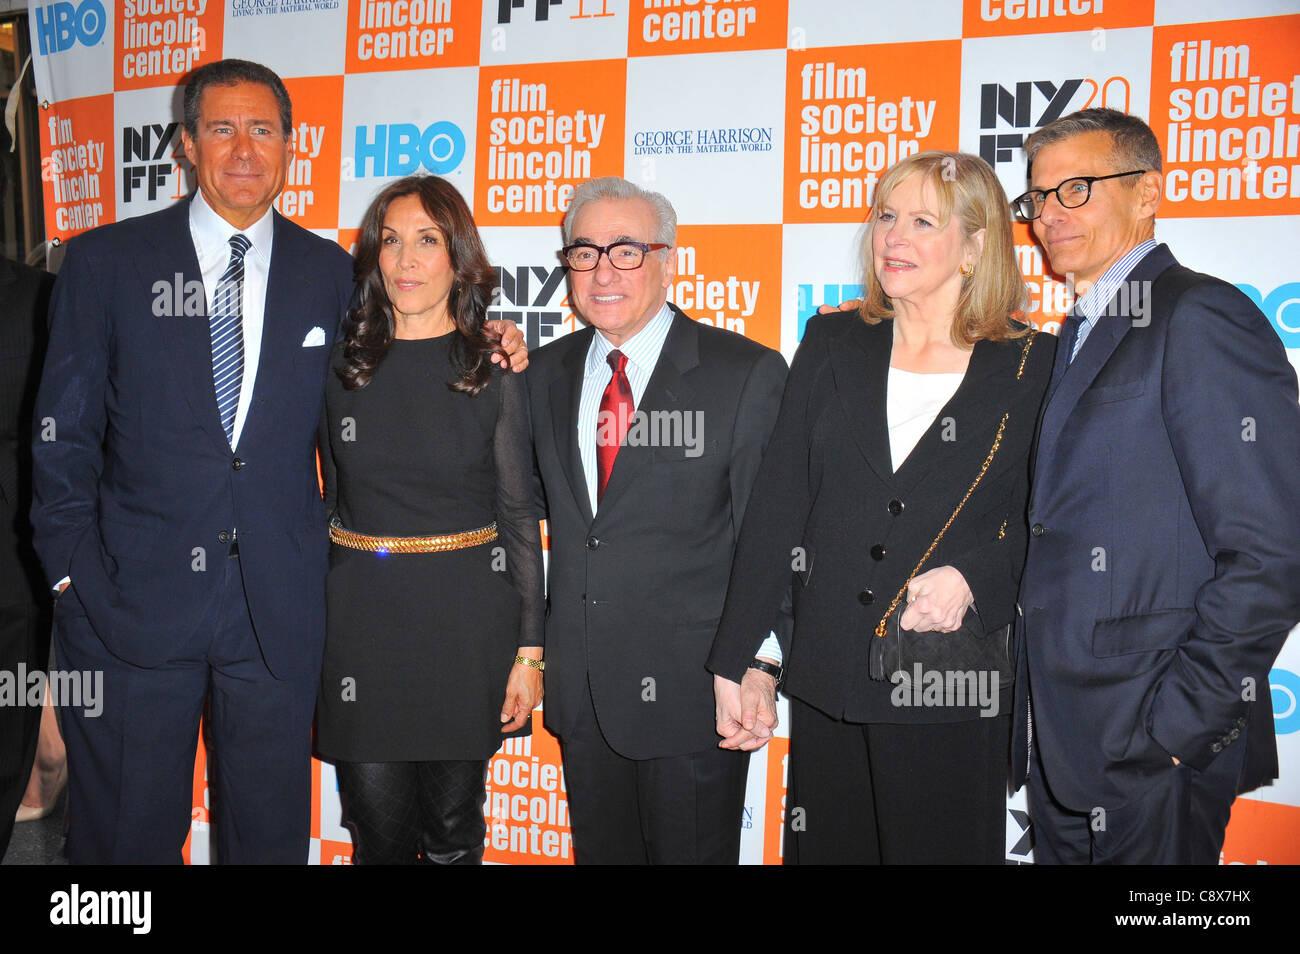 Richard Pepler Olivia Harrison Martin Scorsese Helen Morris Michael Lombardo arrivals GEORGE HARRISON LIVING INMATERIAL - Stock Image